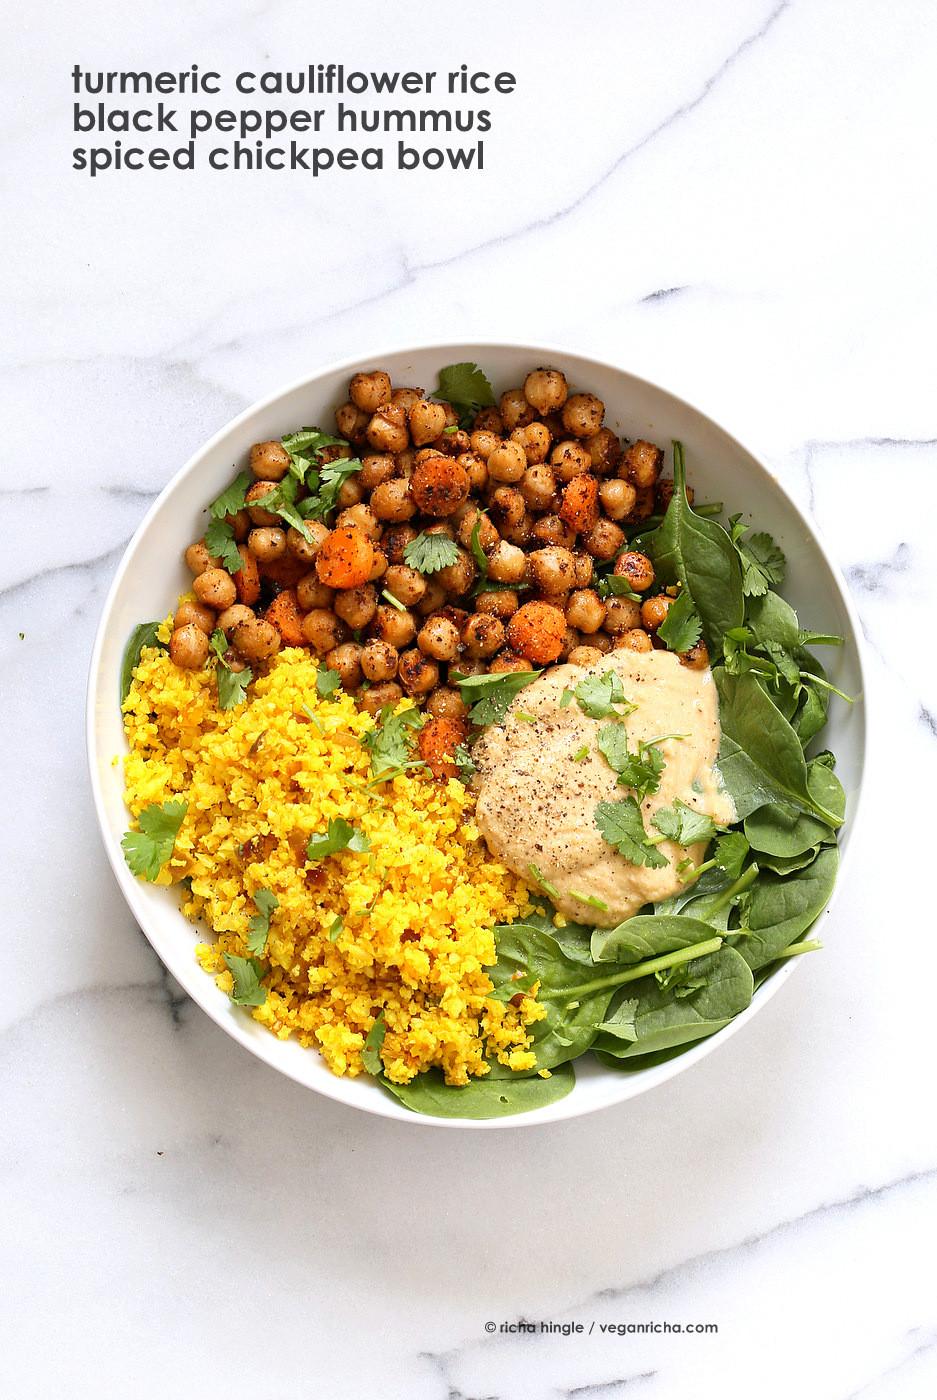 Cauliflower Recipes Vegan  Turmeric Cauliflower Rice Chickpeas Black Pepper Hummus